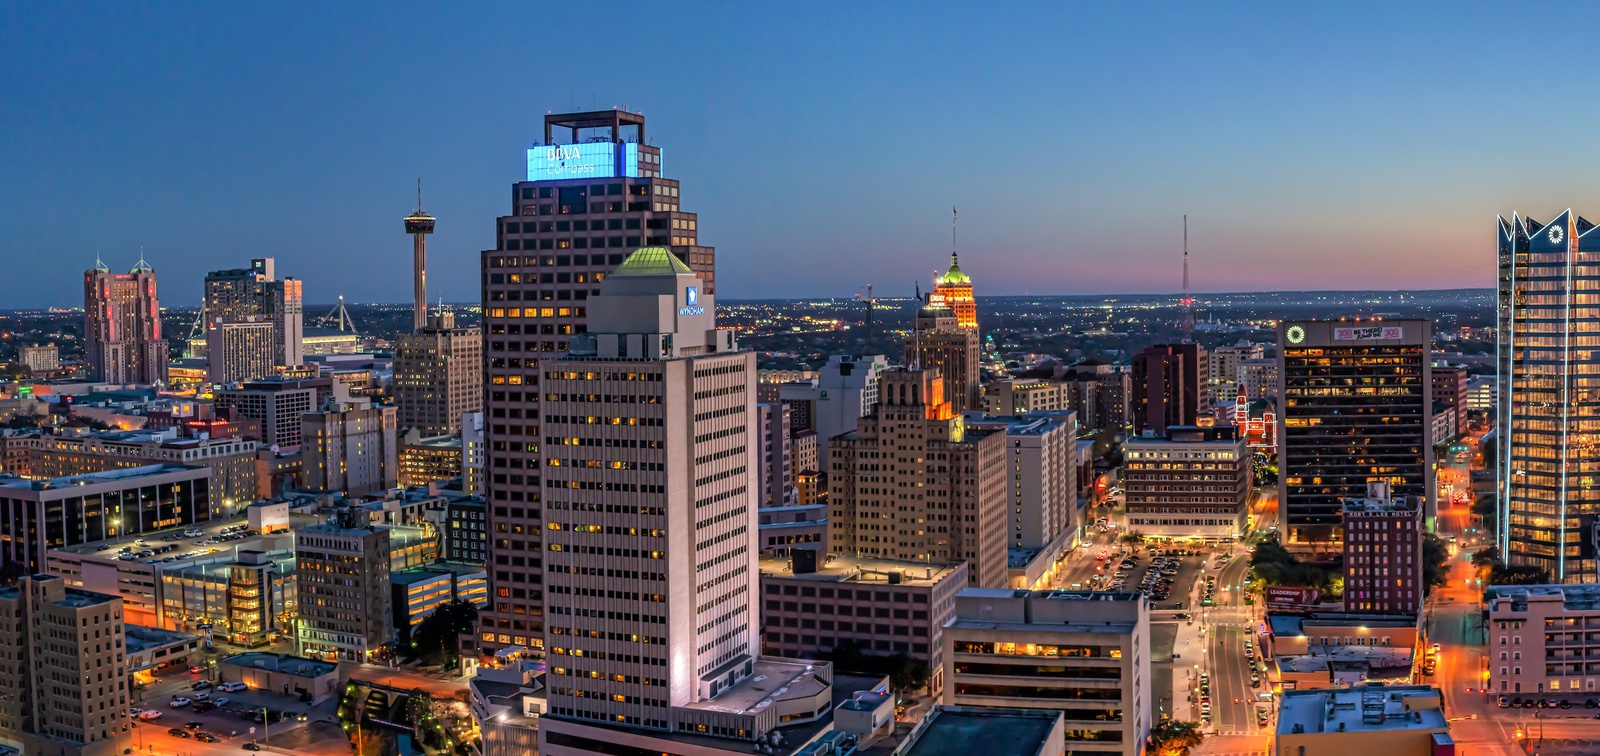 San Antonio power provider sues ERCOT, citing 'unlawful' pricing